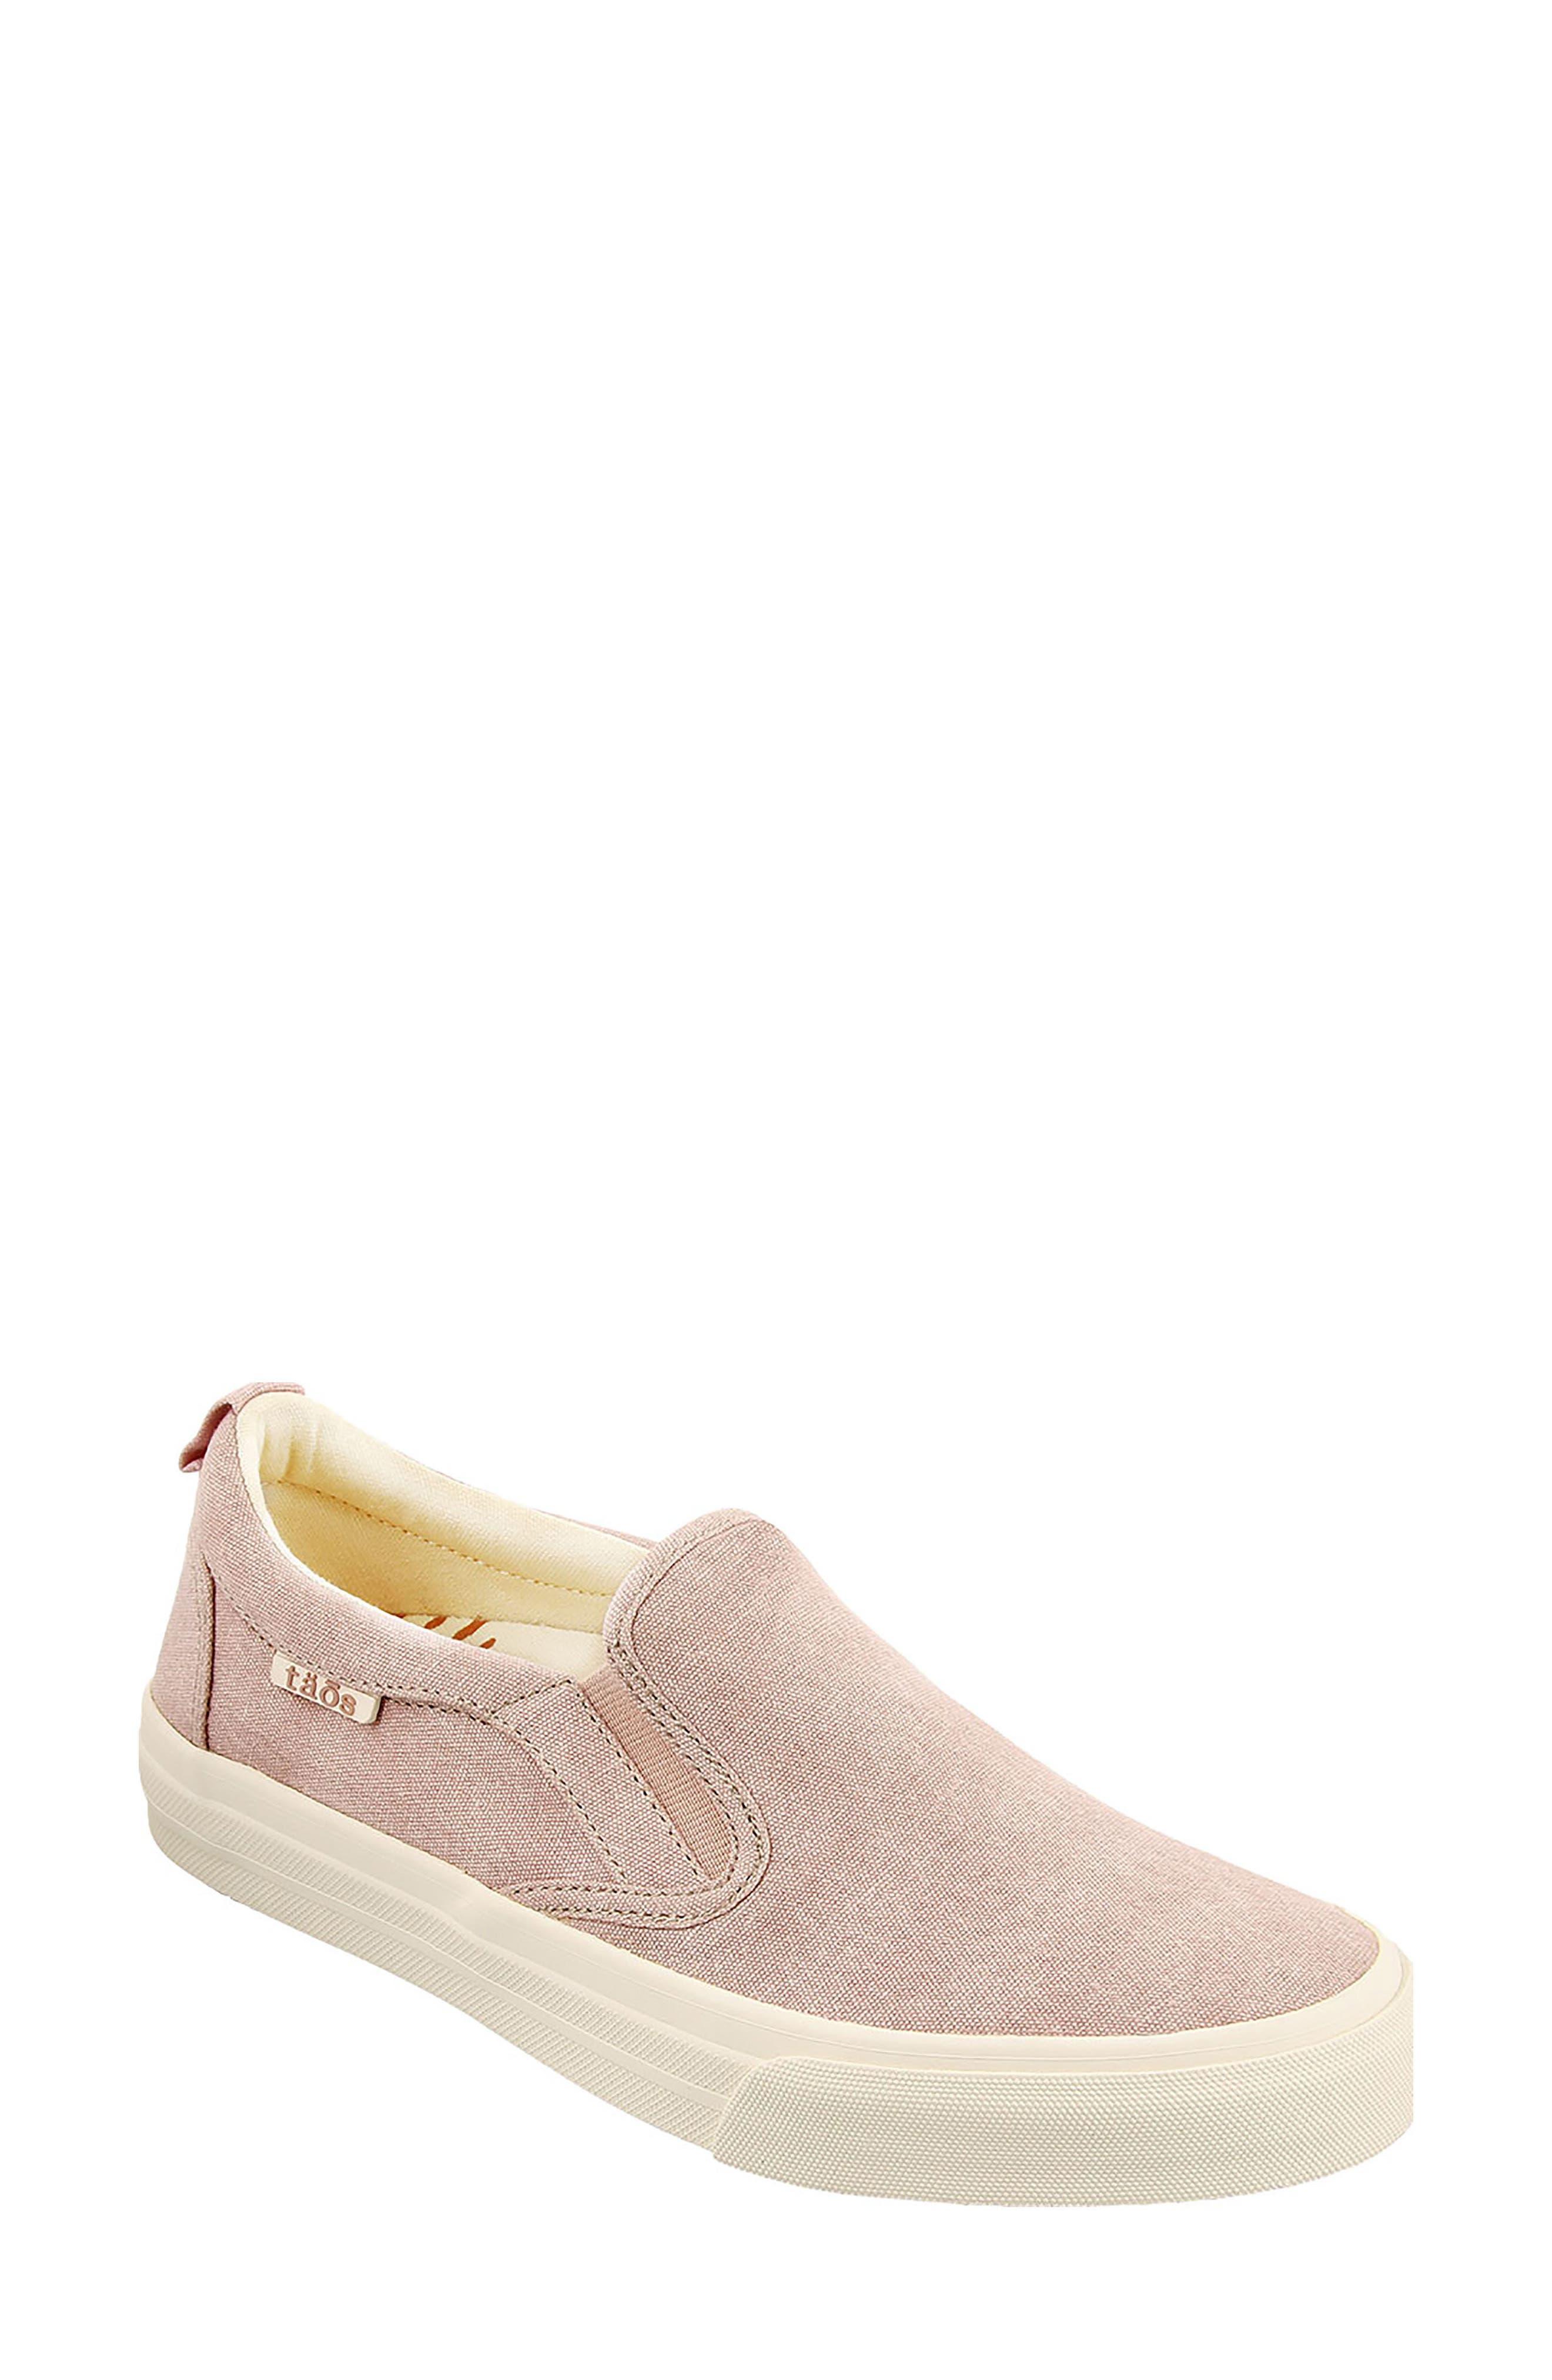 Soul Slip-On Sneaker,                         Main,                         color, Pink Wash Canvas